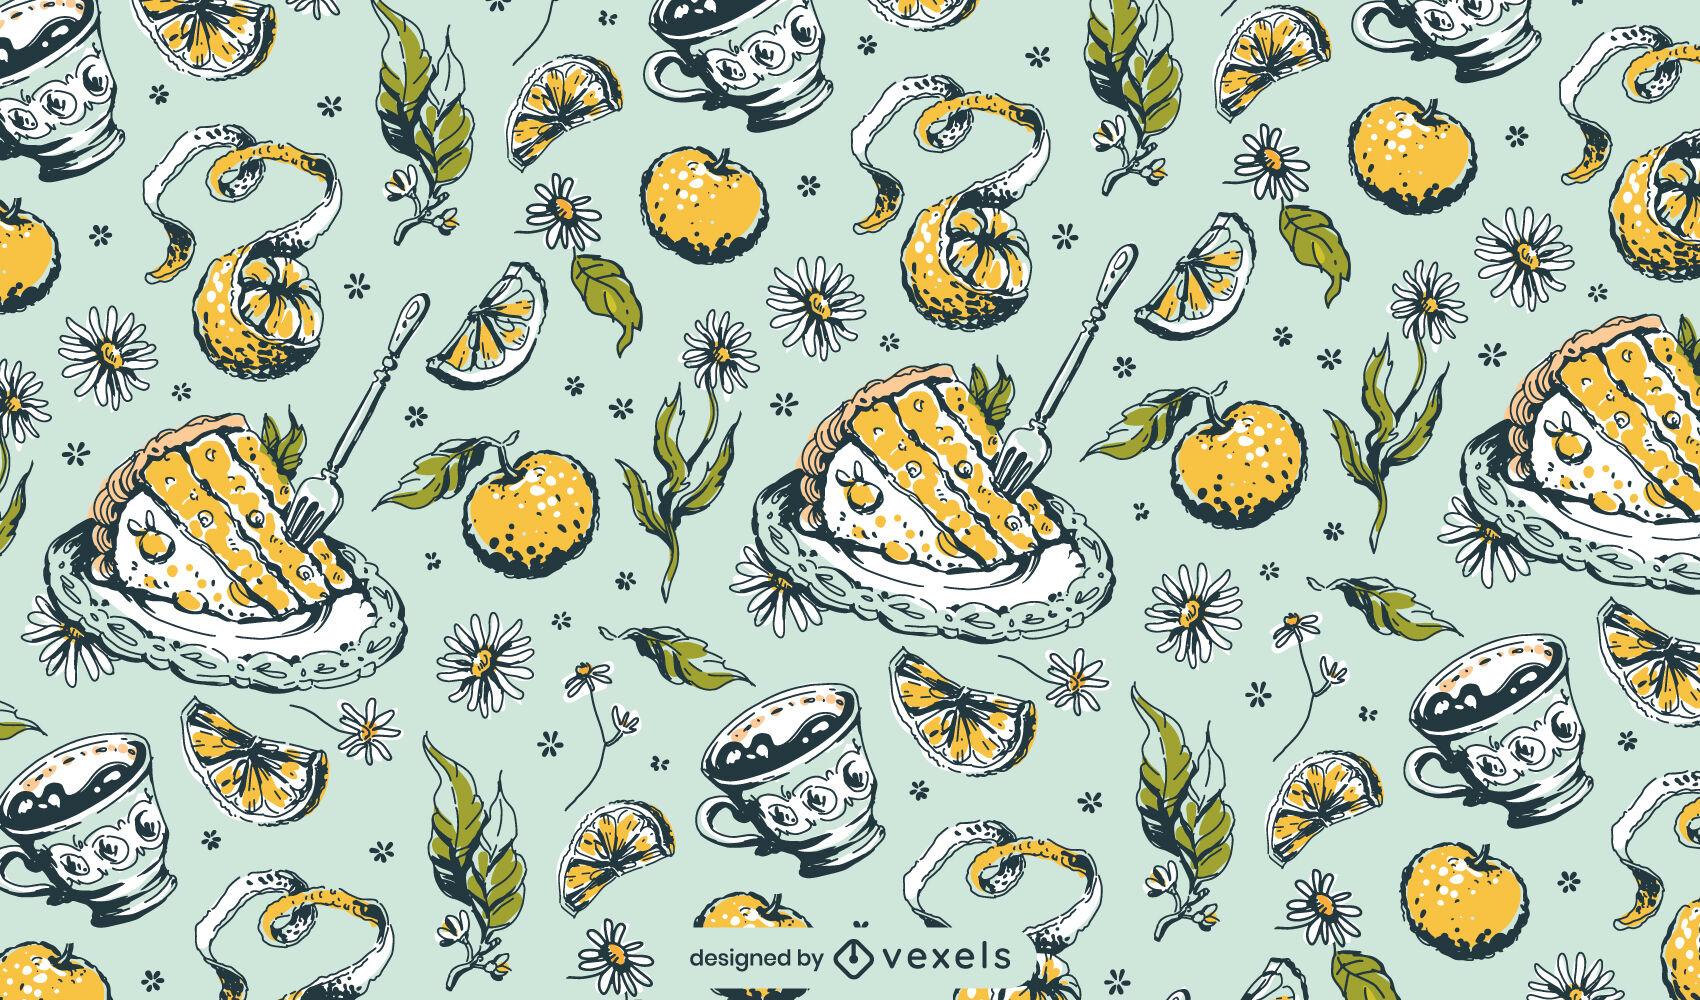 Sweet food tea time vintage pattern design